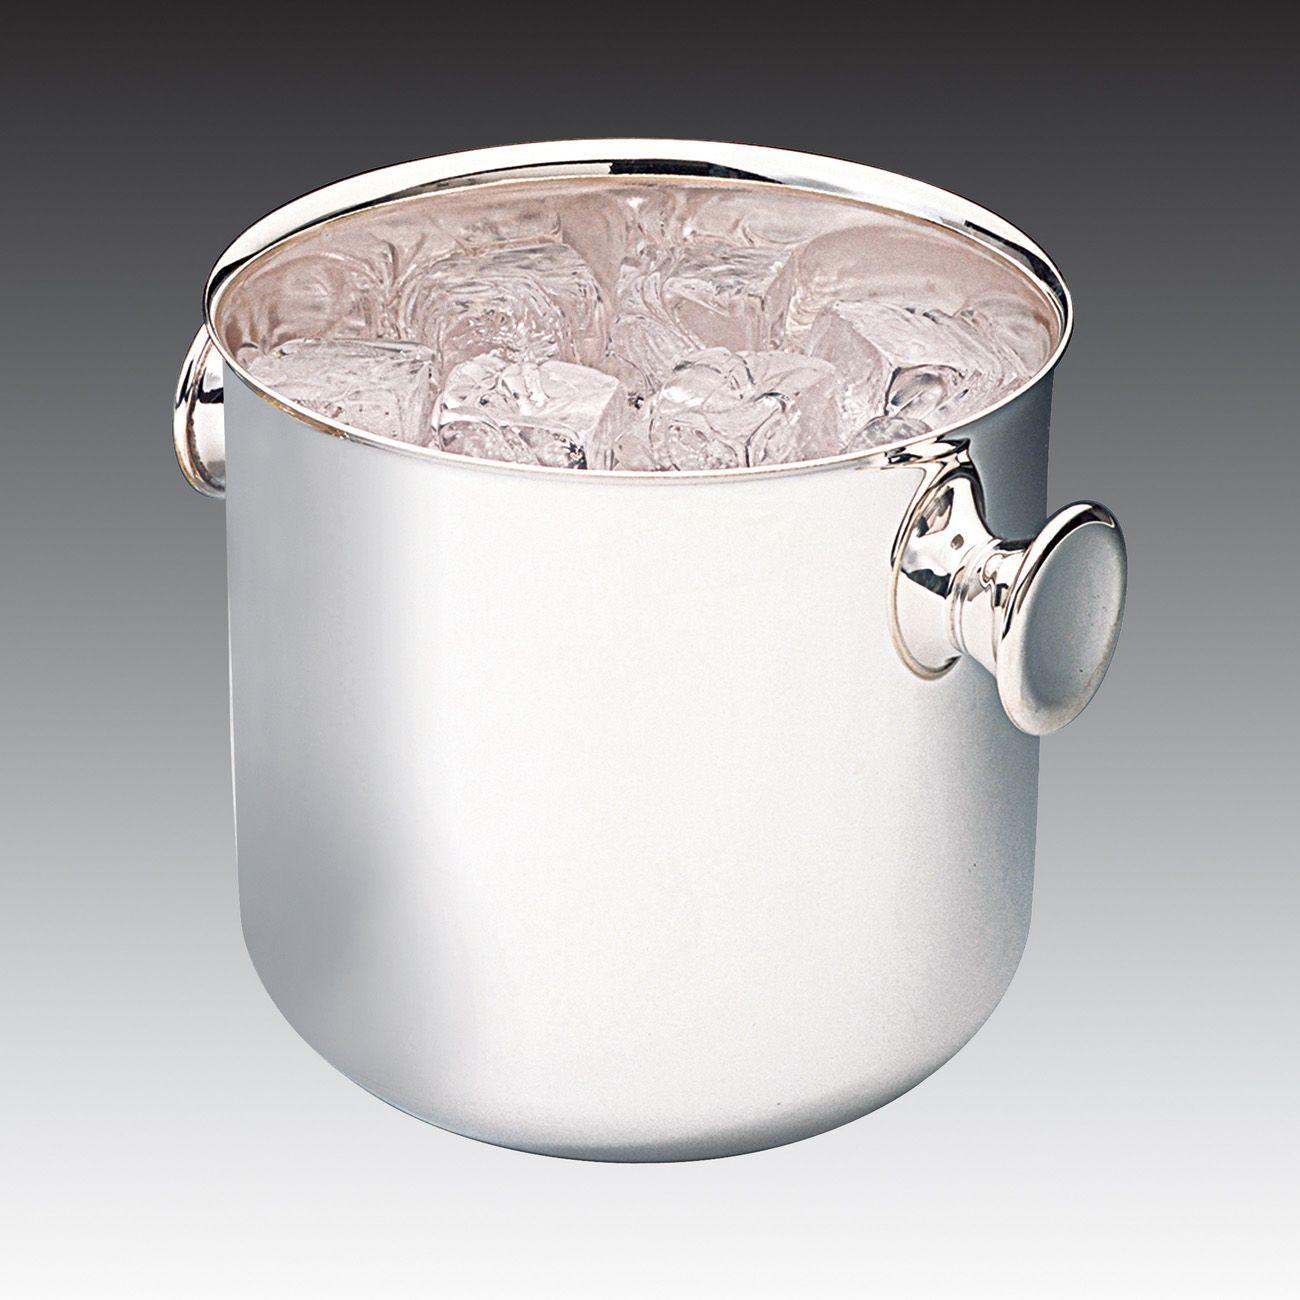 Balde De Gelo em Aço Inox 1,2L - Elegance Wolff